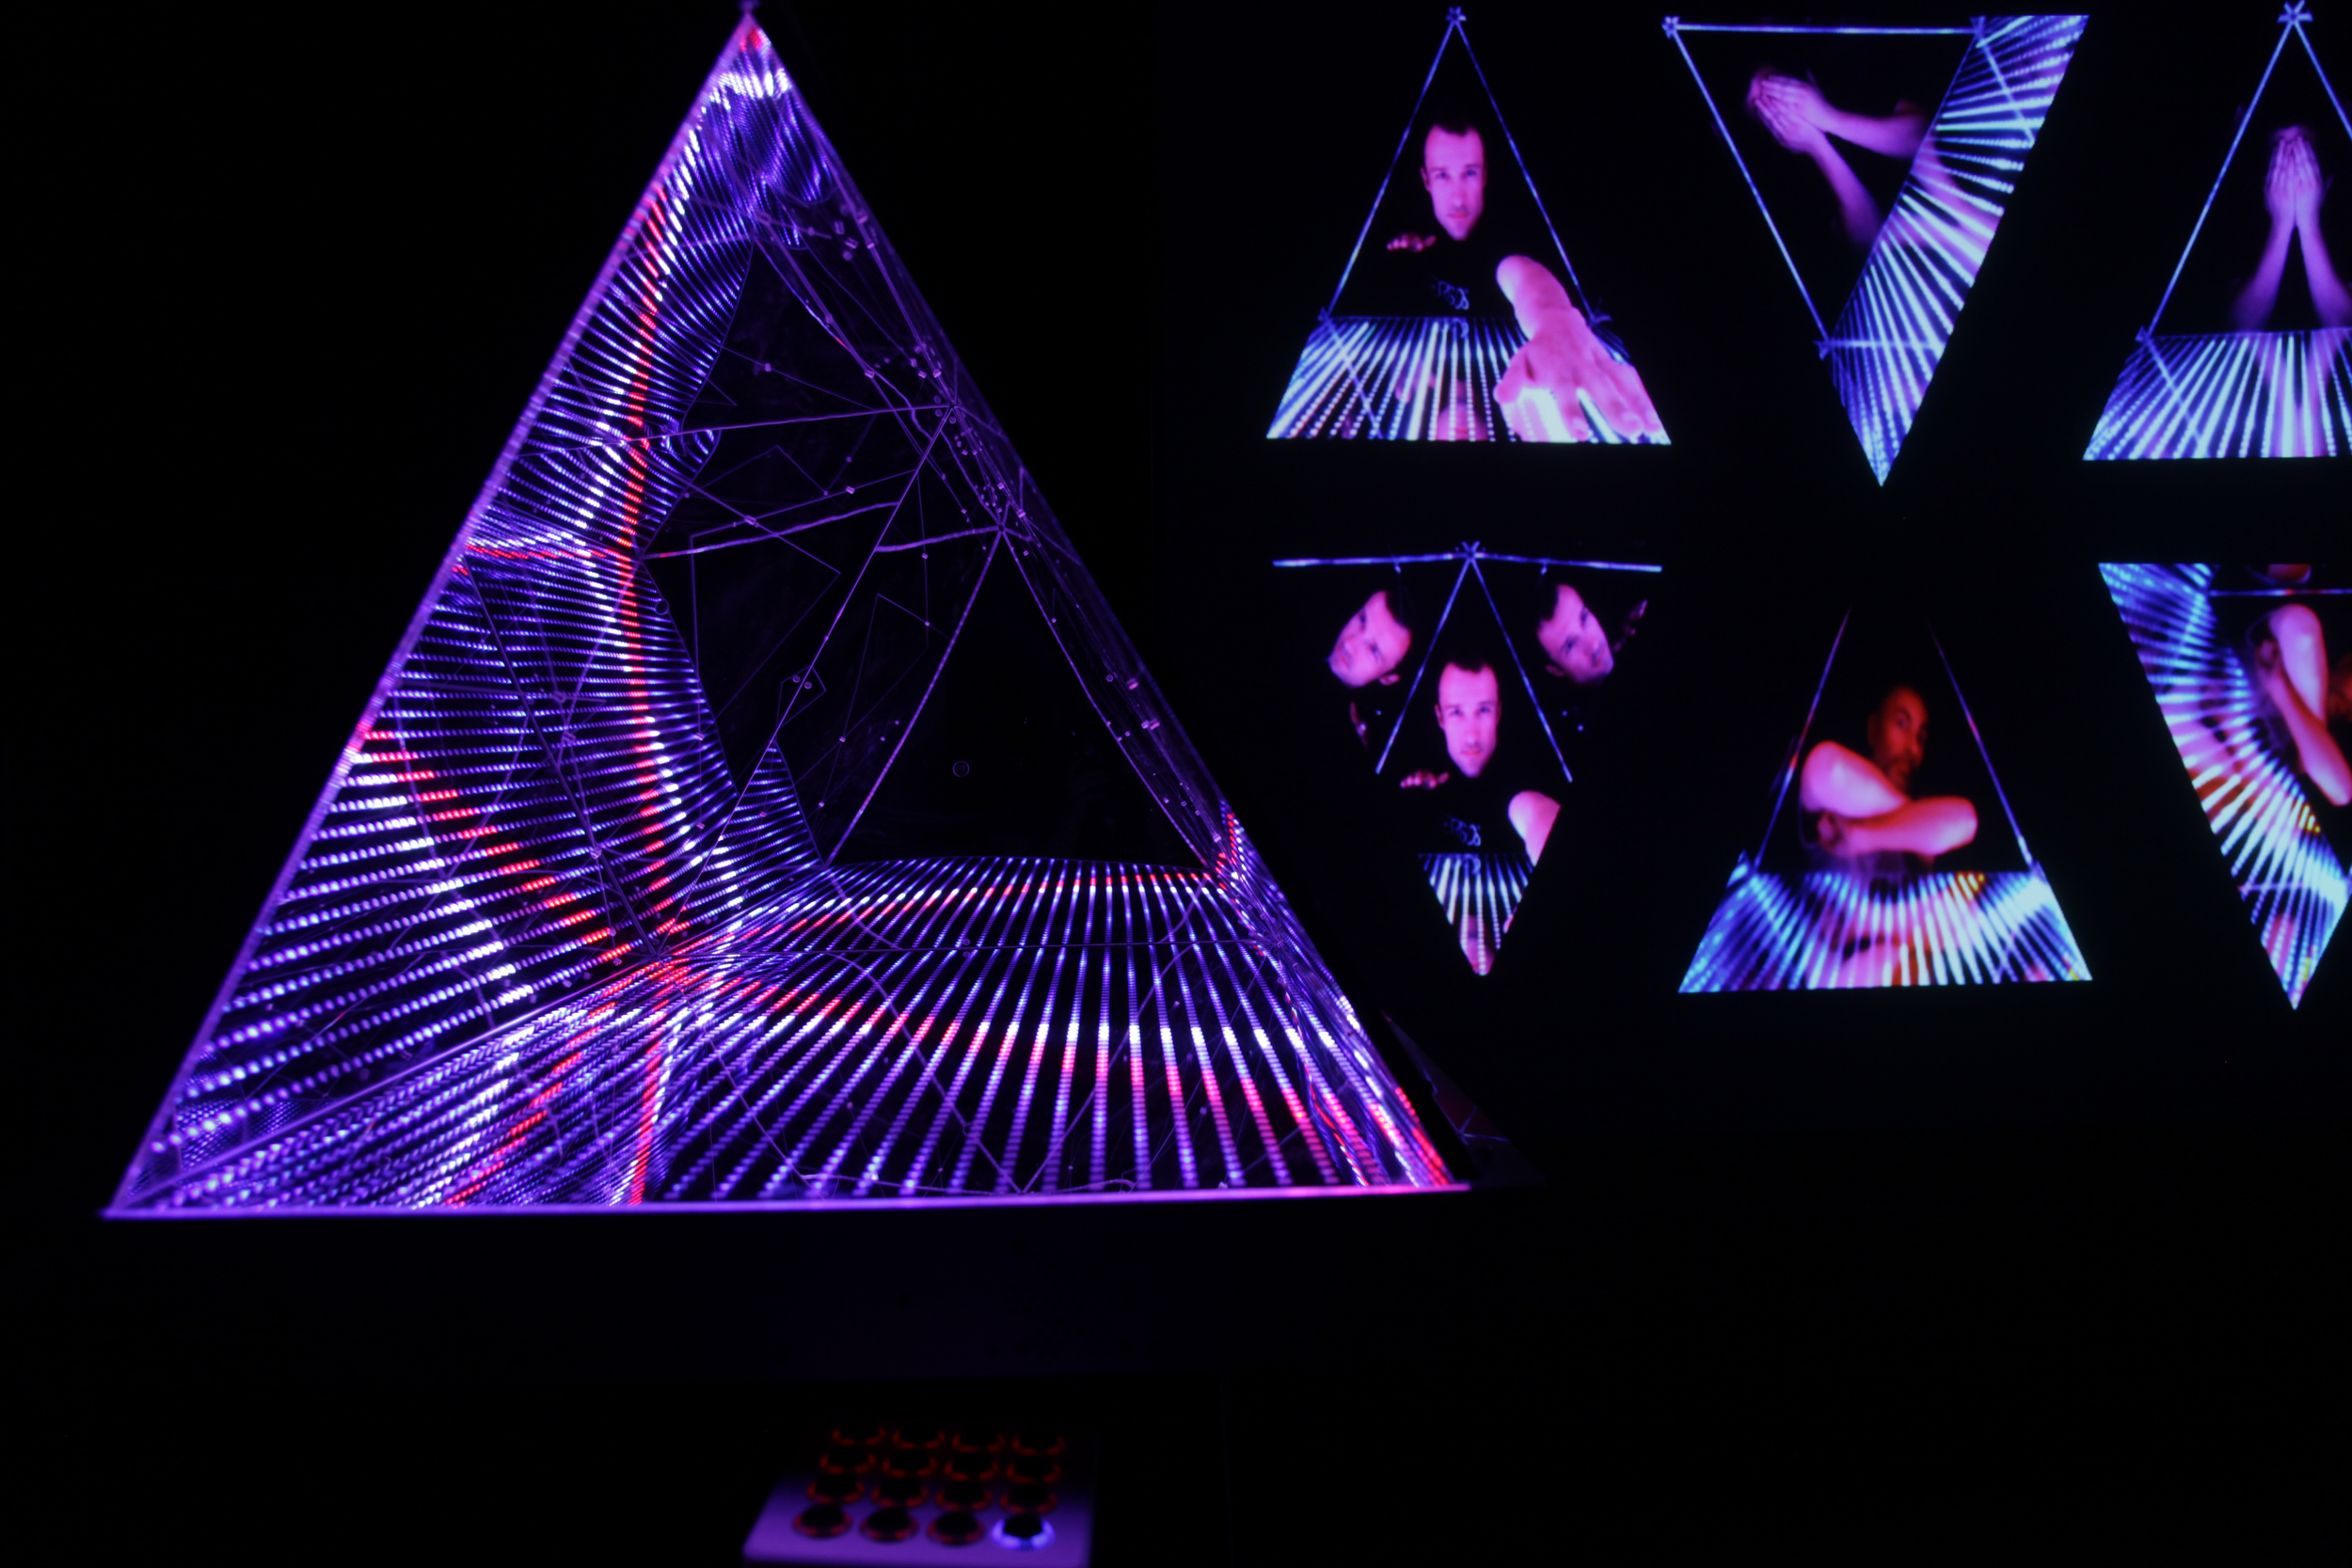 Asteriskos-KaLEDoscope-VJculture-GrantDavis-LED-Miirror-interactive-selfie.jpg